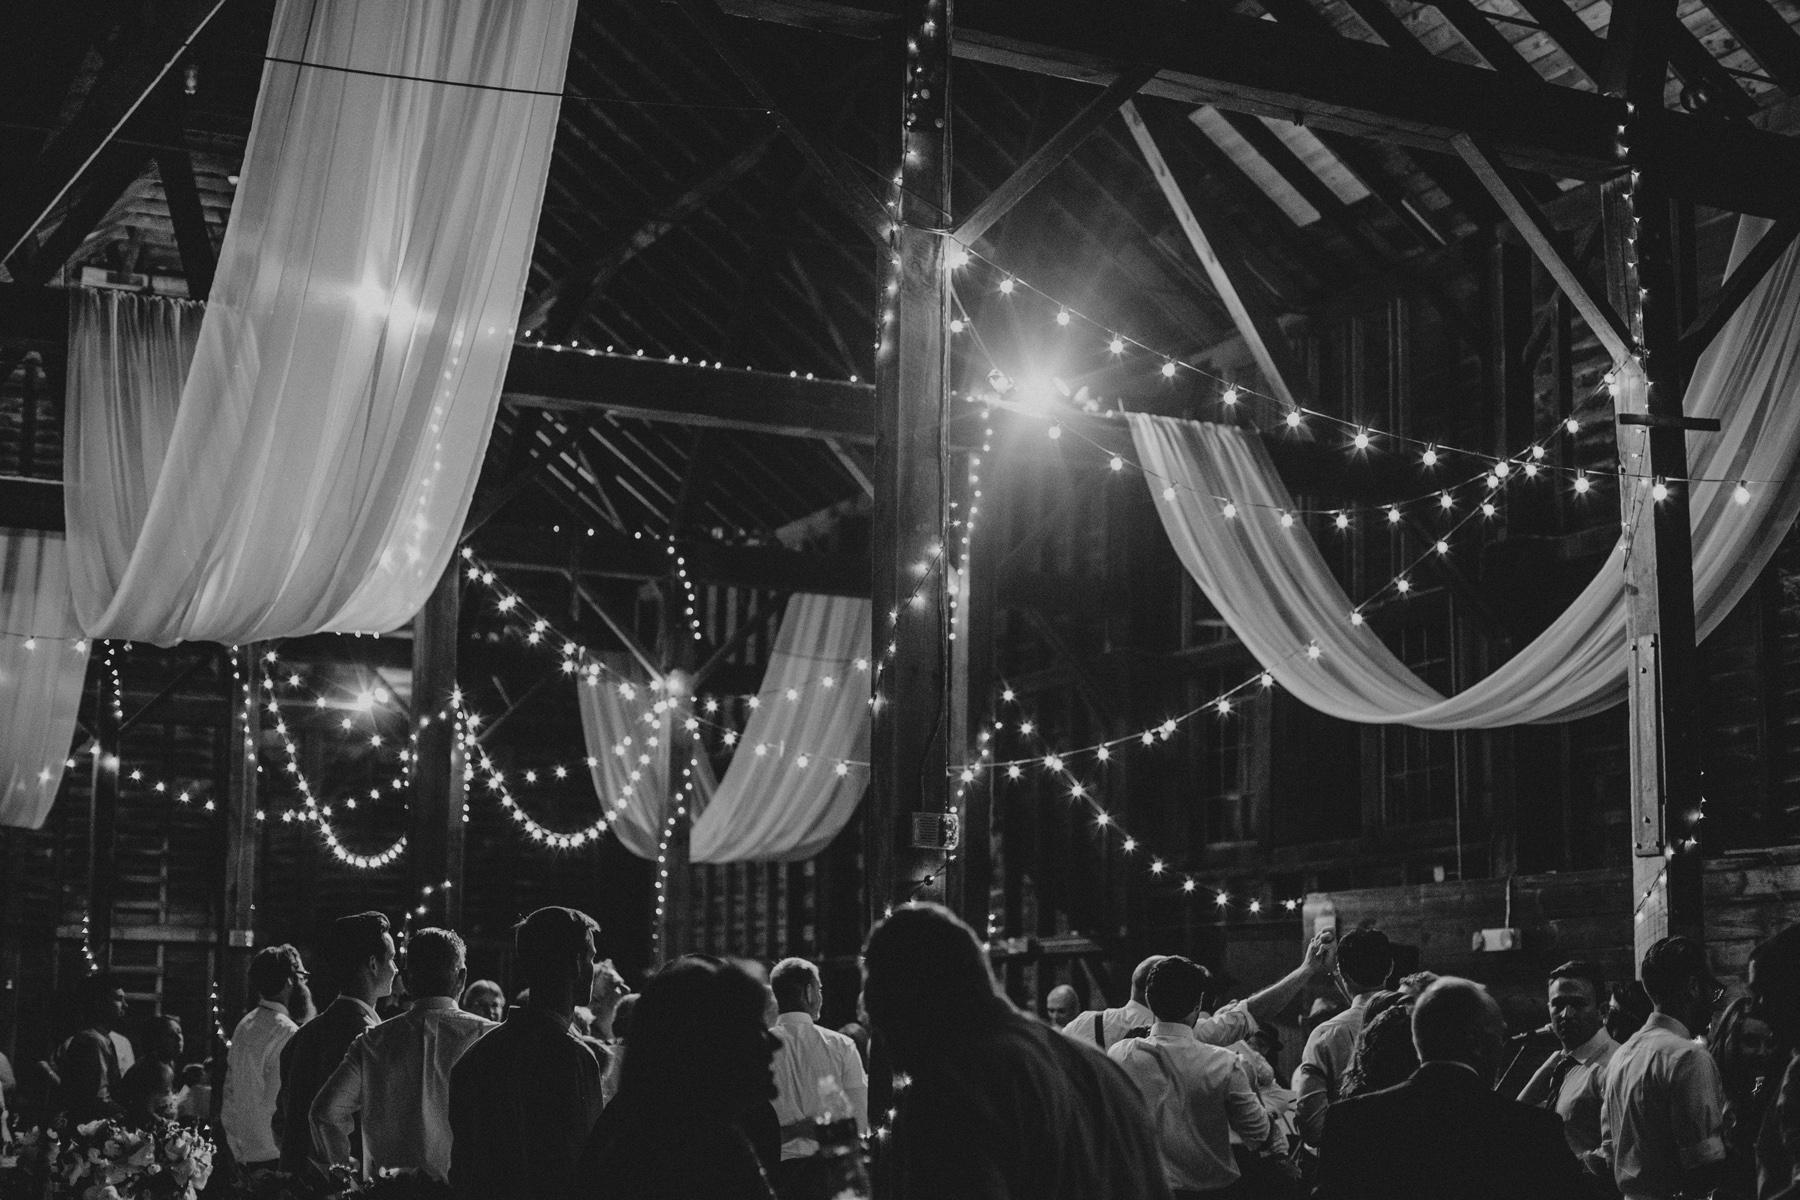 shaker_heritage_barn_wedding_0063.jpg